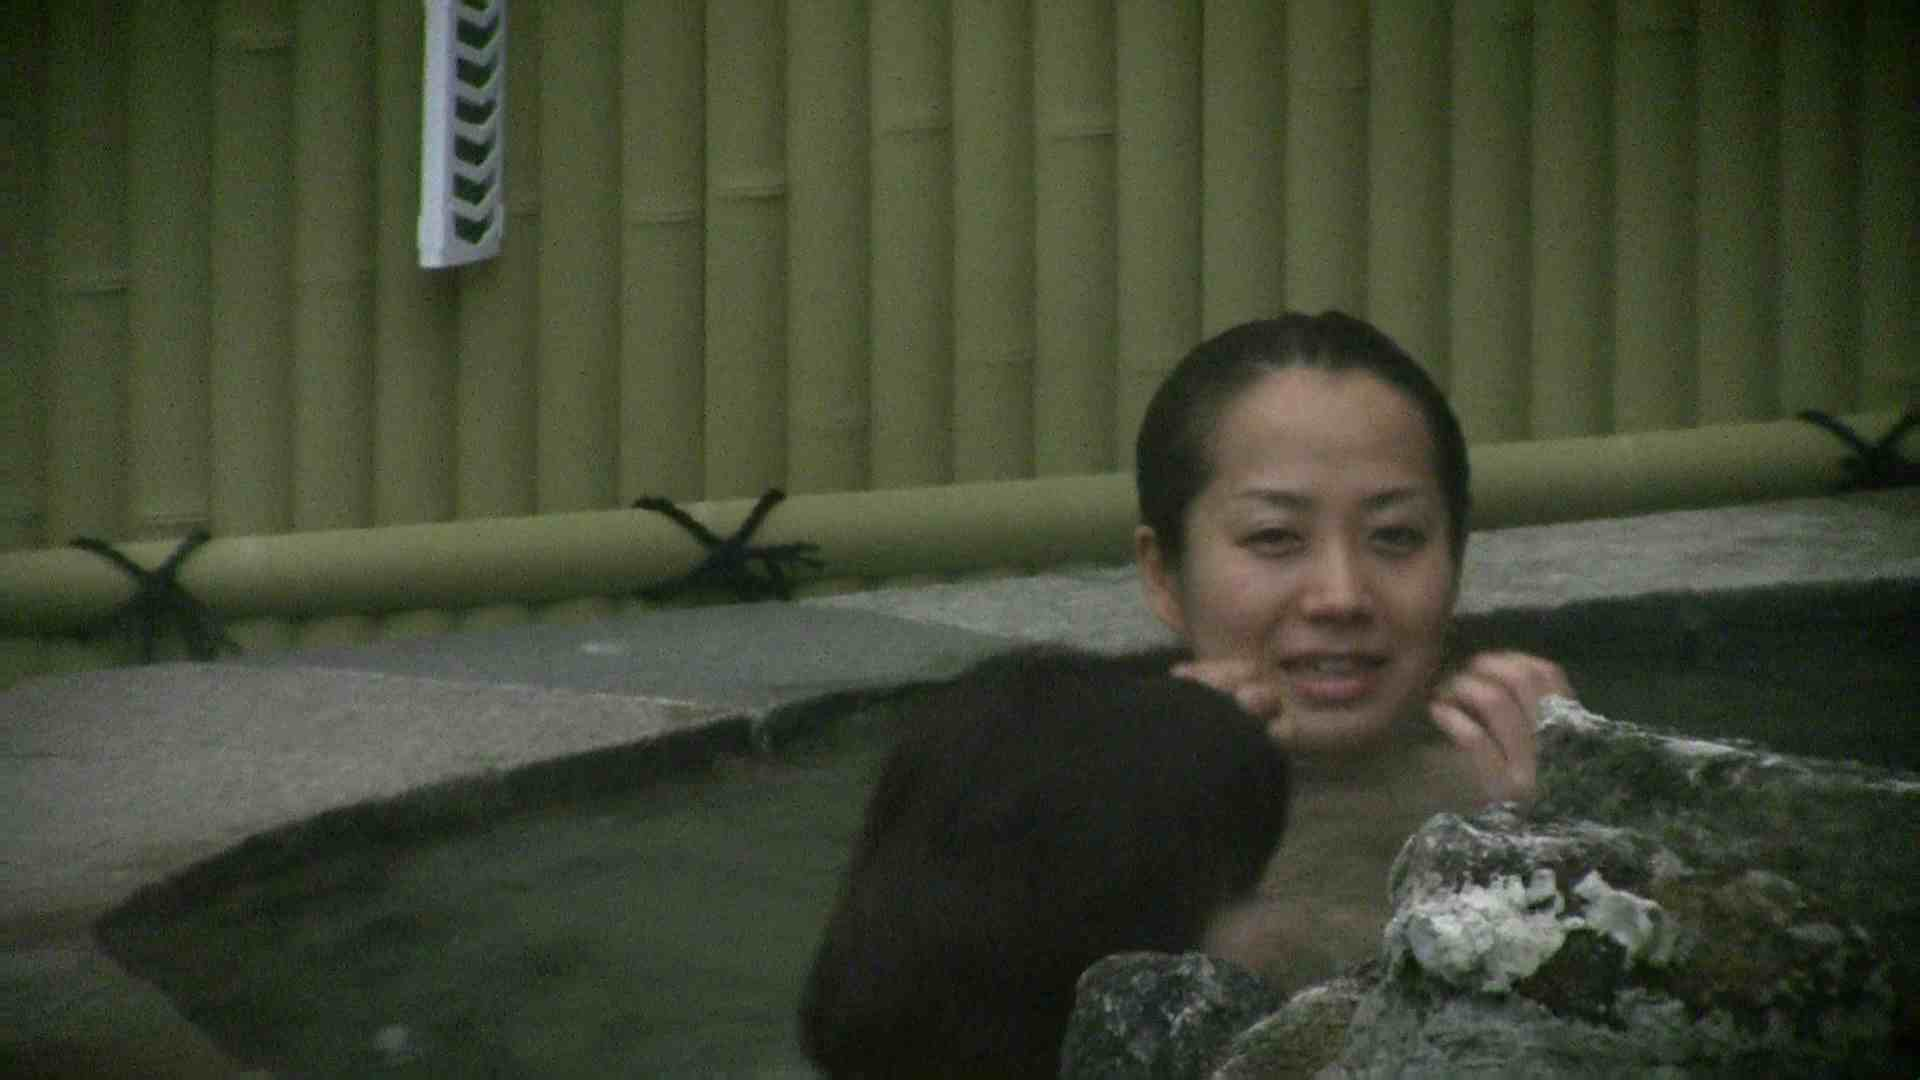 Aquaな露天風呂Vol.539 盗撮  62pic 3